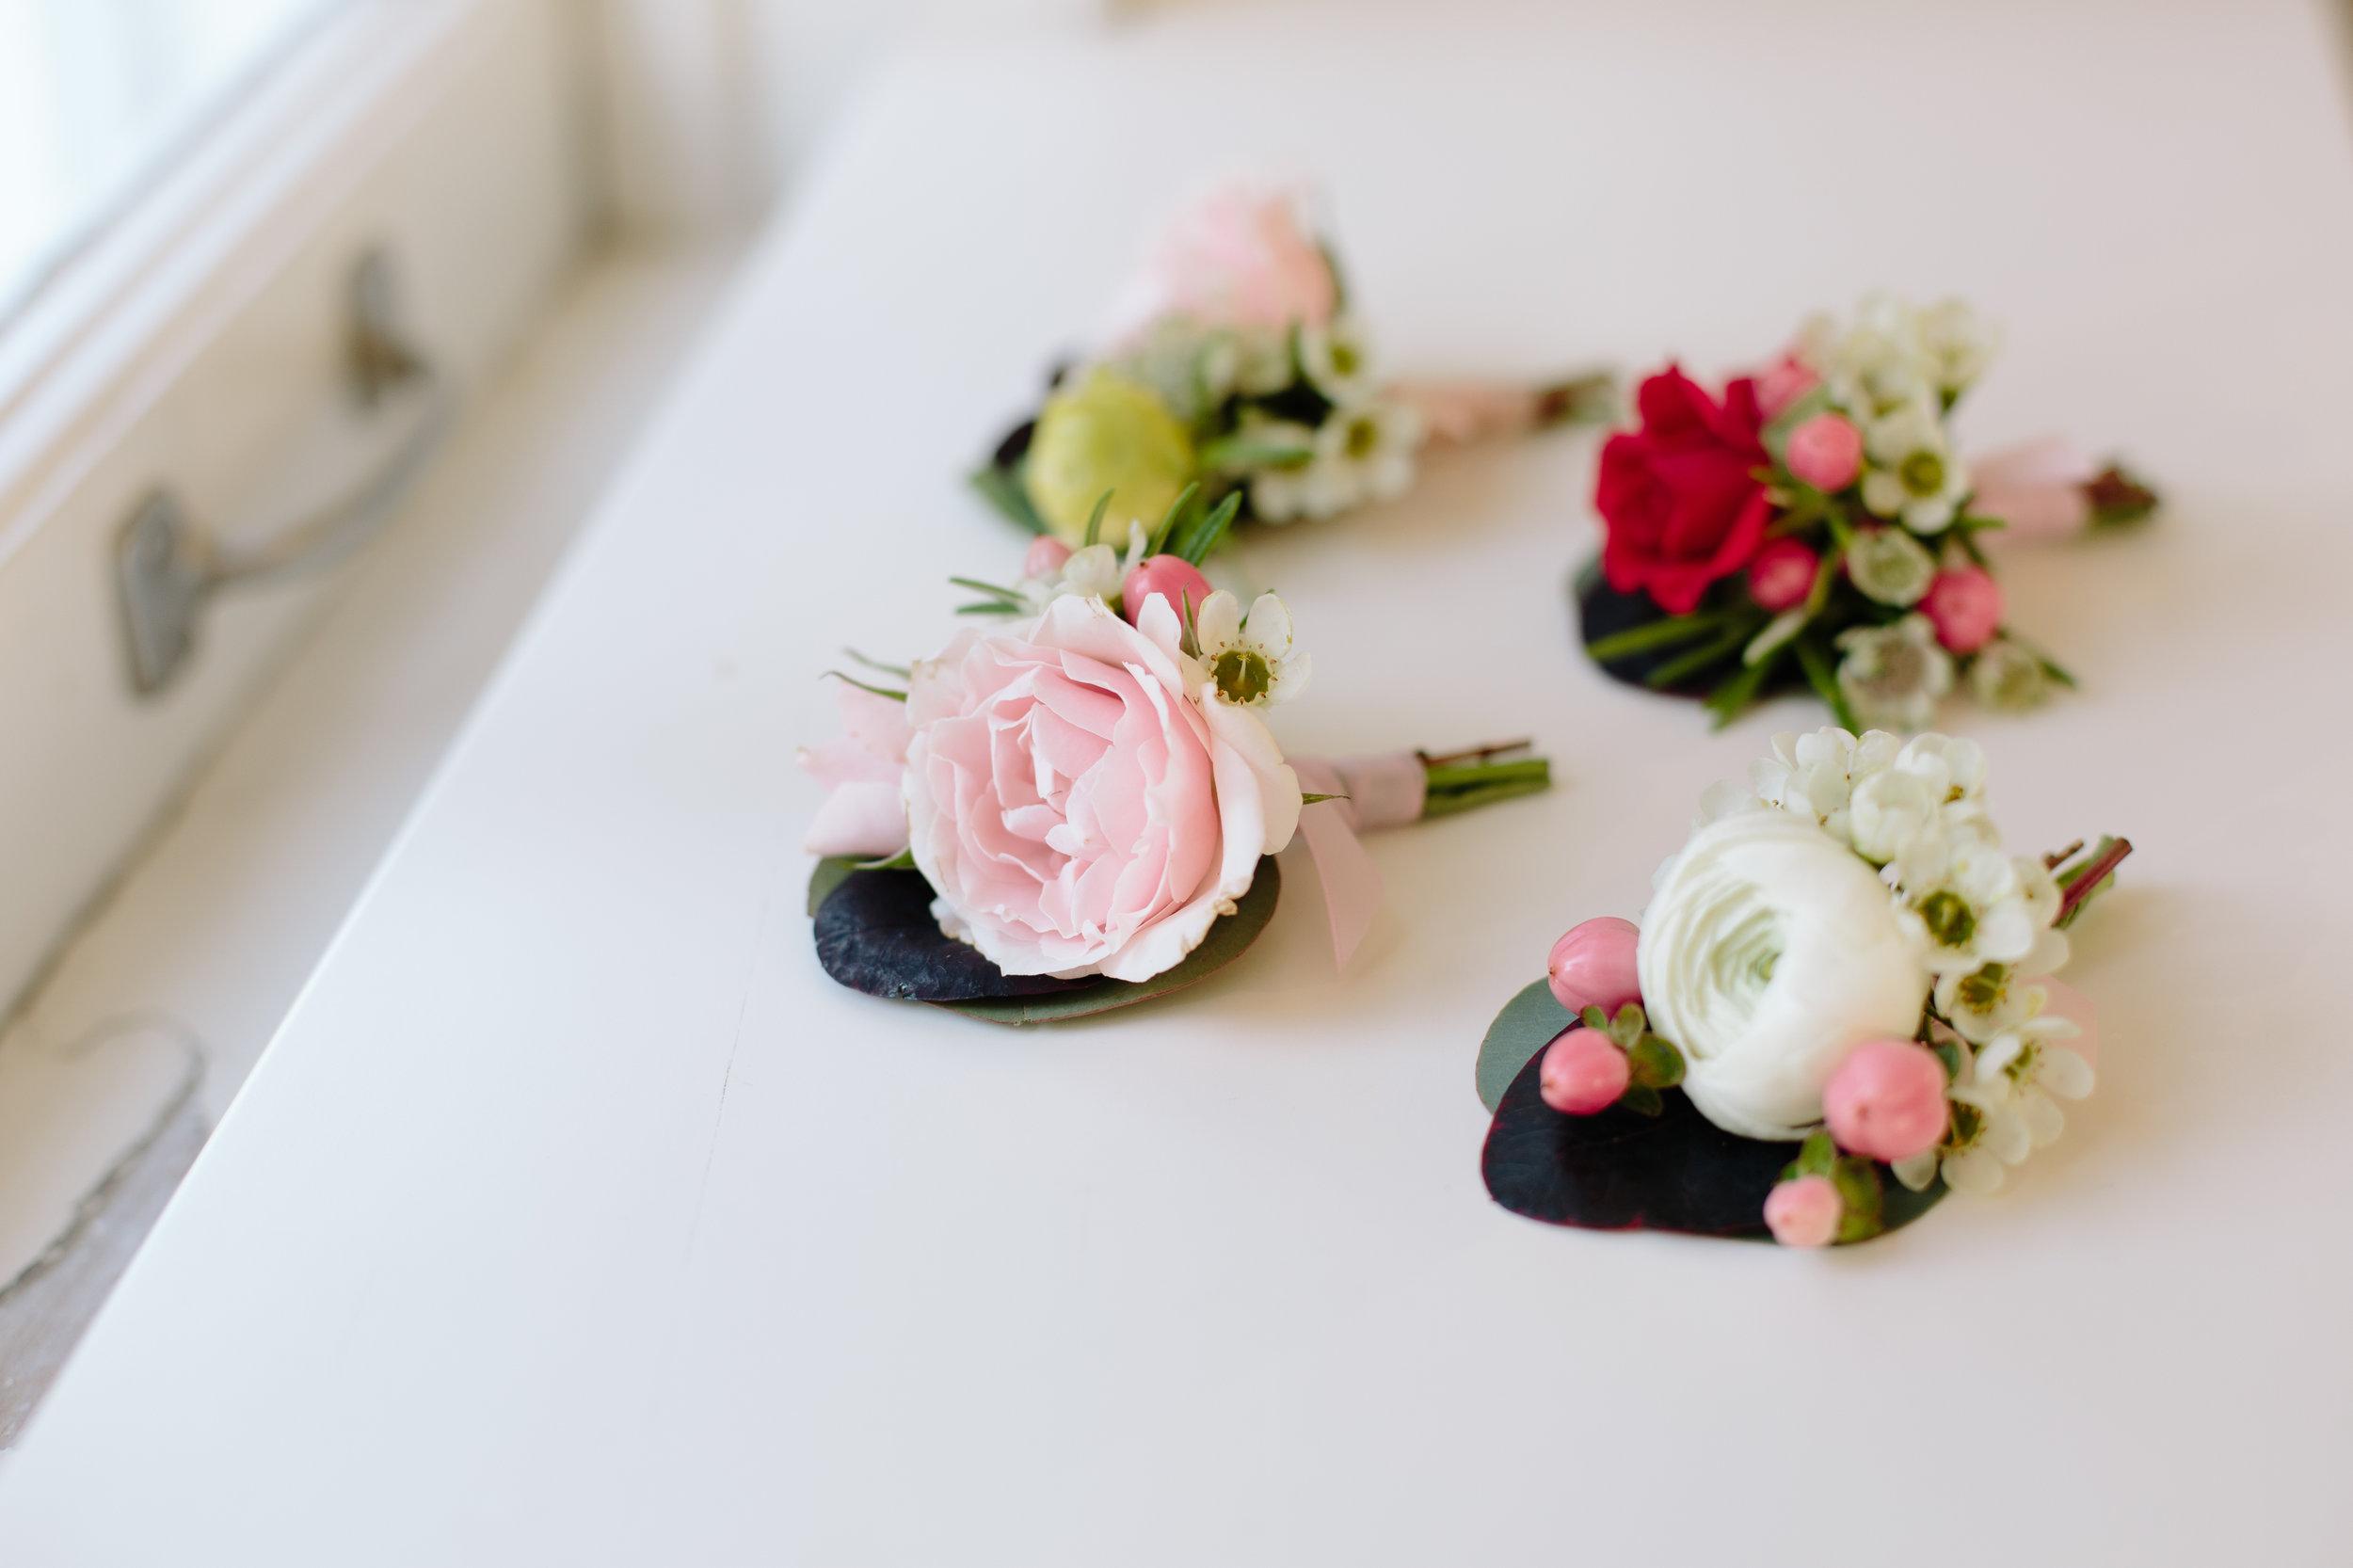 Phoebe Lo Events Toronto Wedding - Estates of Sunnybrook Rustic Event 007.jpg